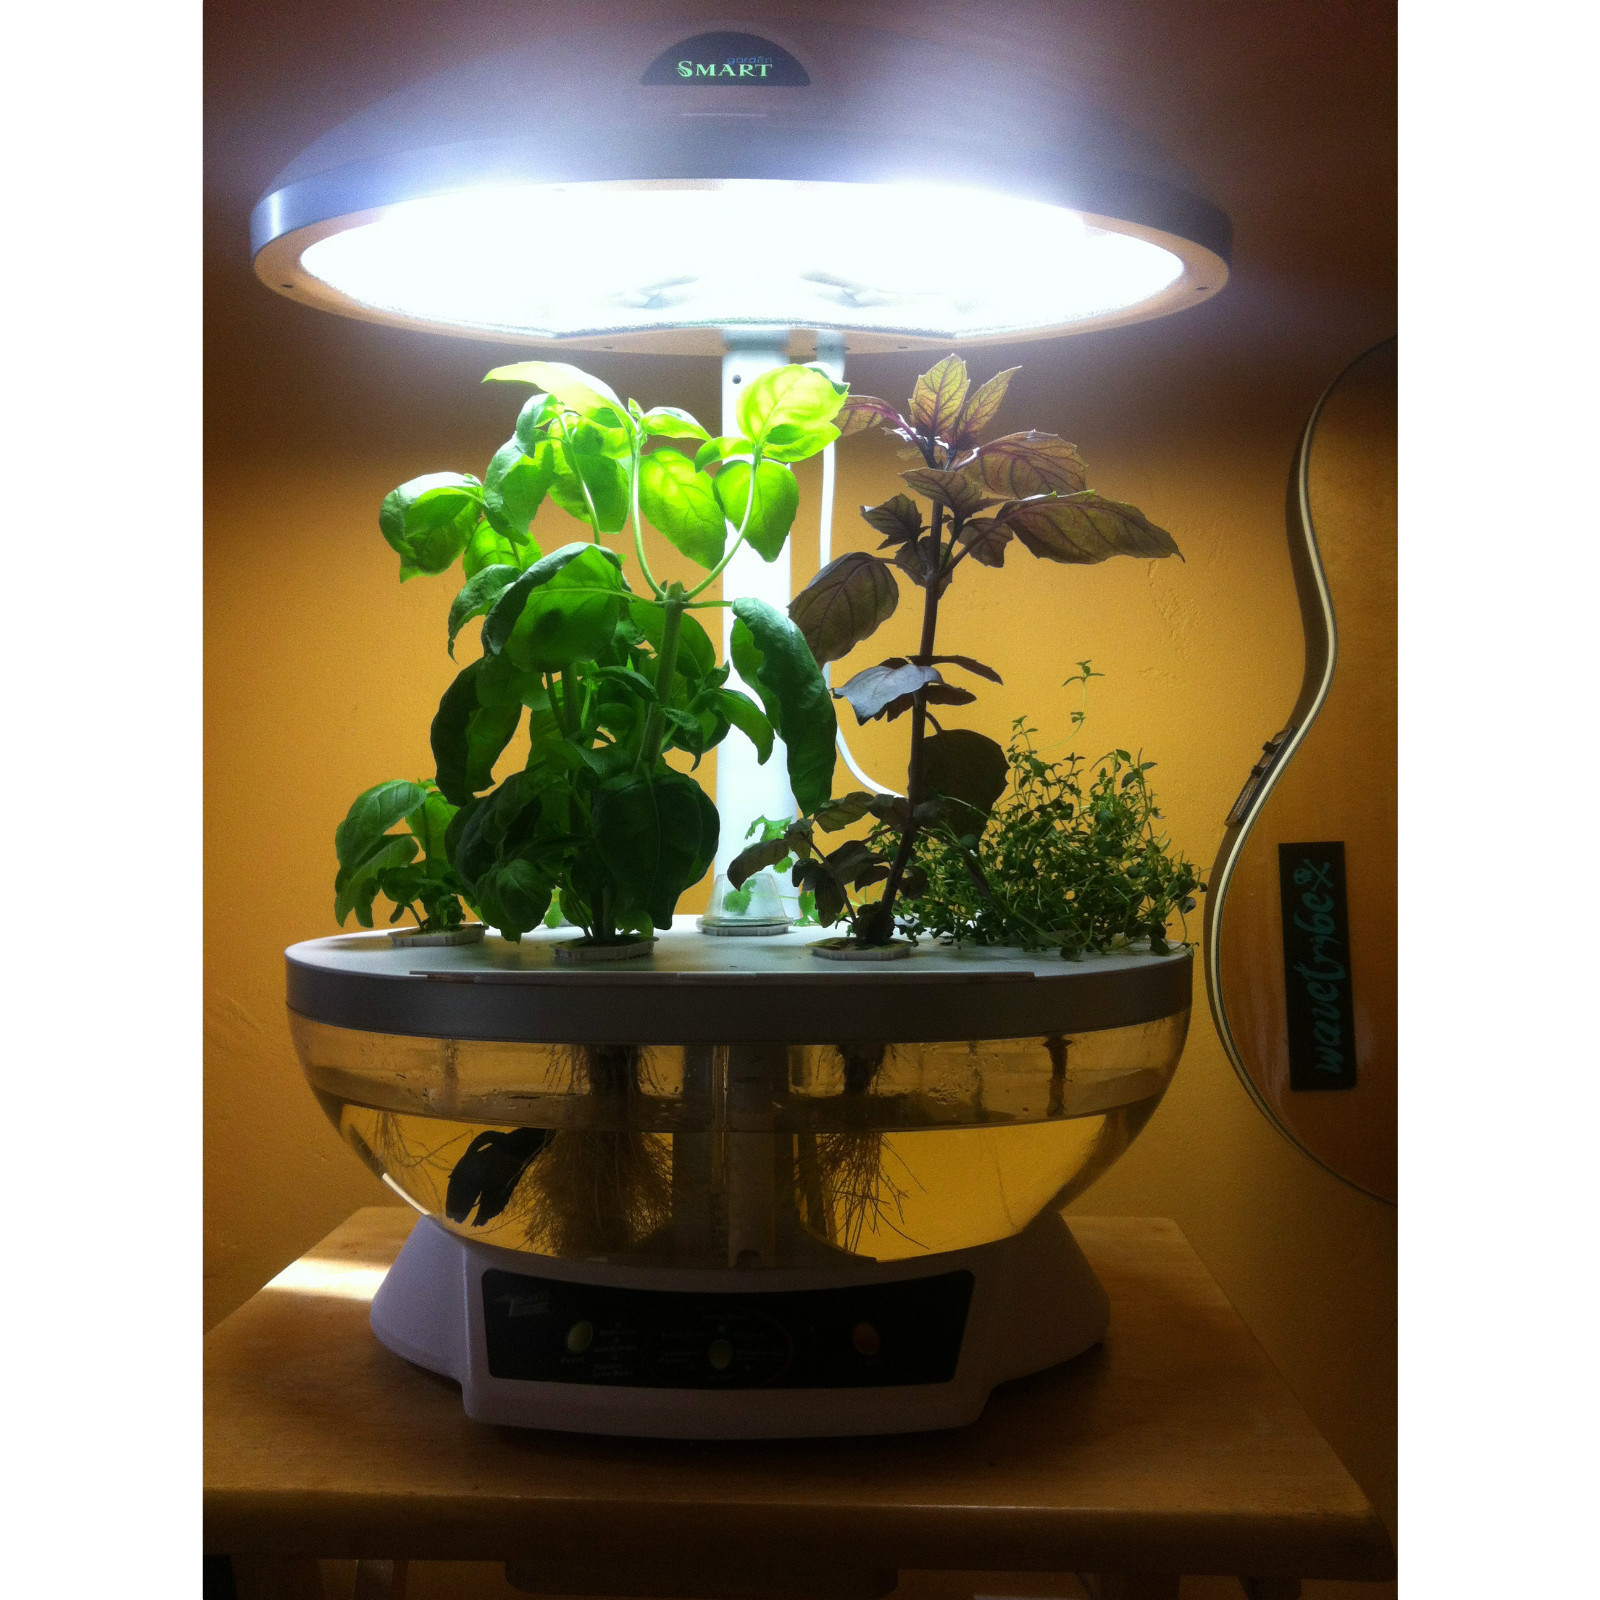 Aquaponics system fish tank aquarium planter grow light for How to grow hydro in a fish tank